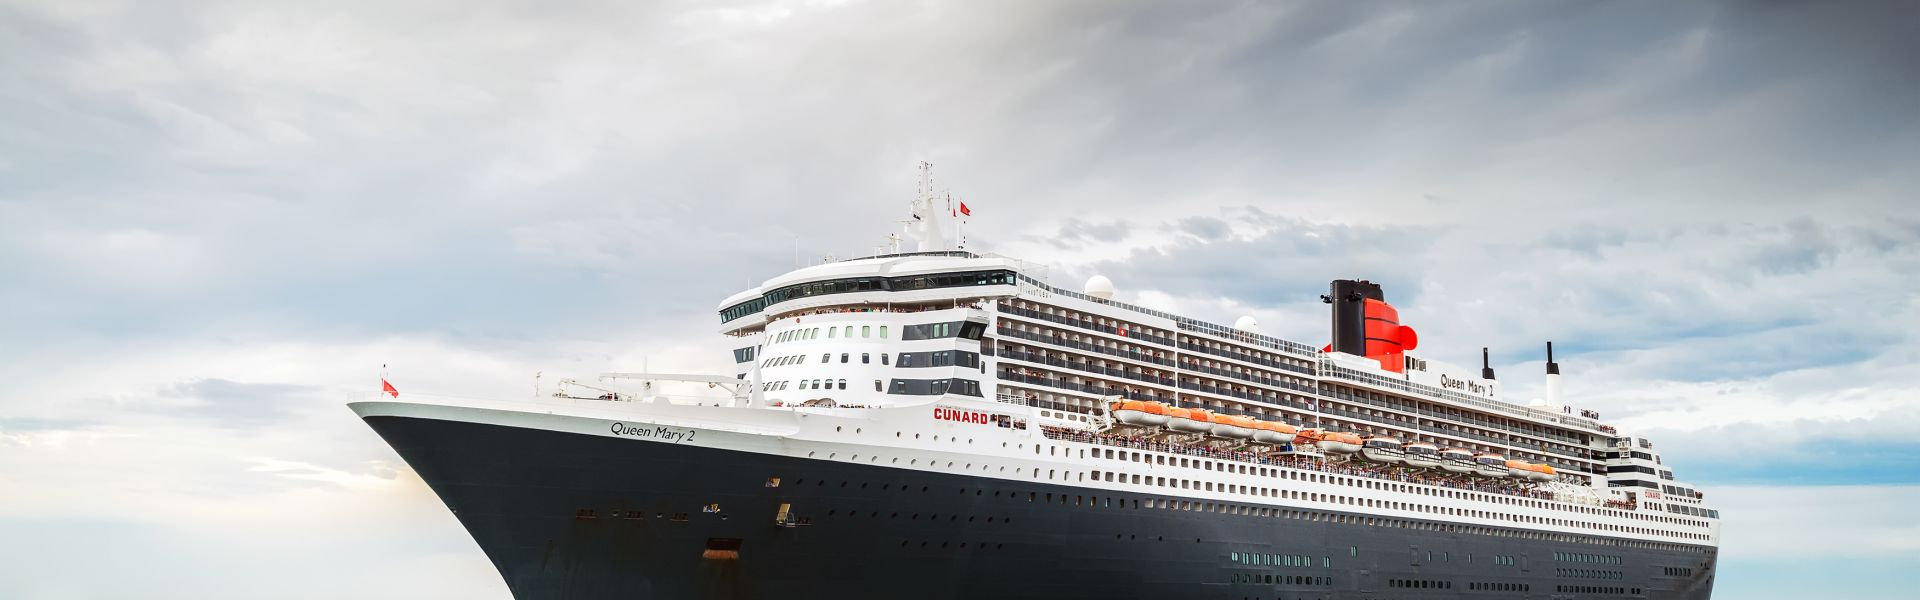 Croaziera 2019 - Japonia si Orientul Indepartat (Hong Kong) - Cunard Line - Queen Mary 2 - 14 nopti